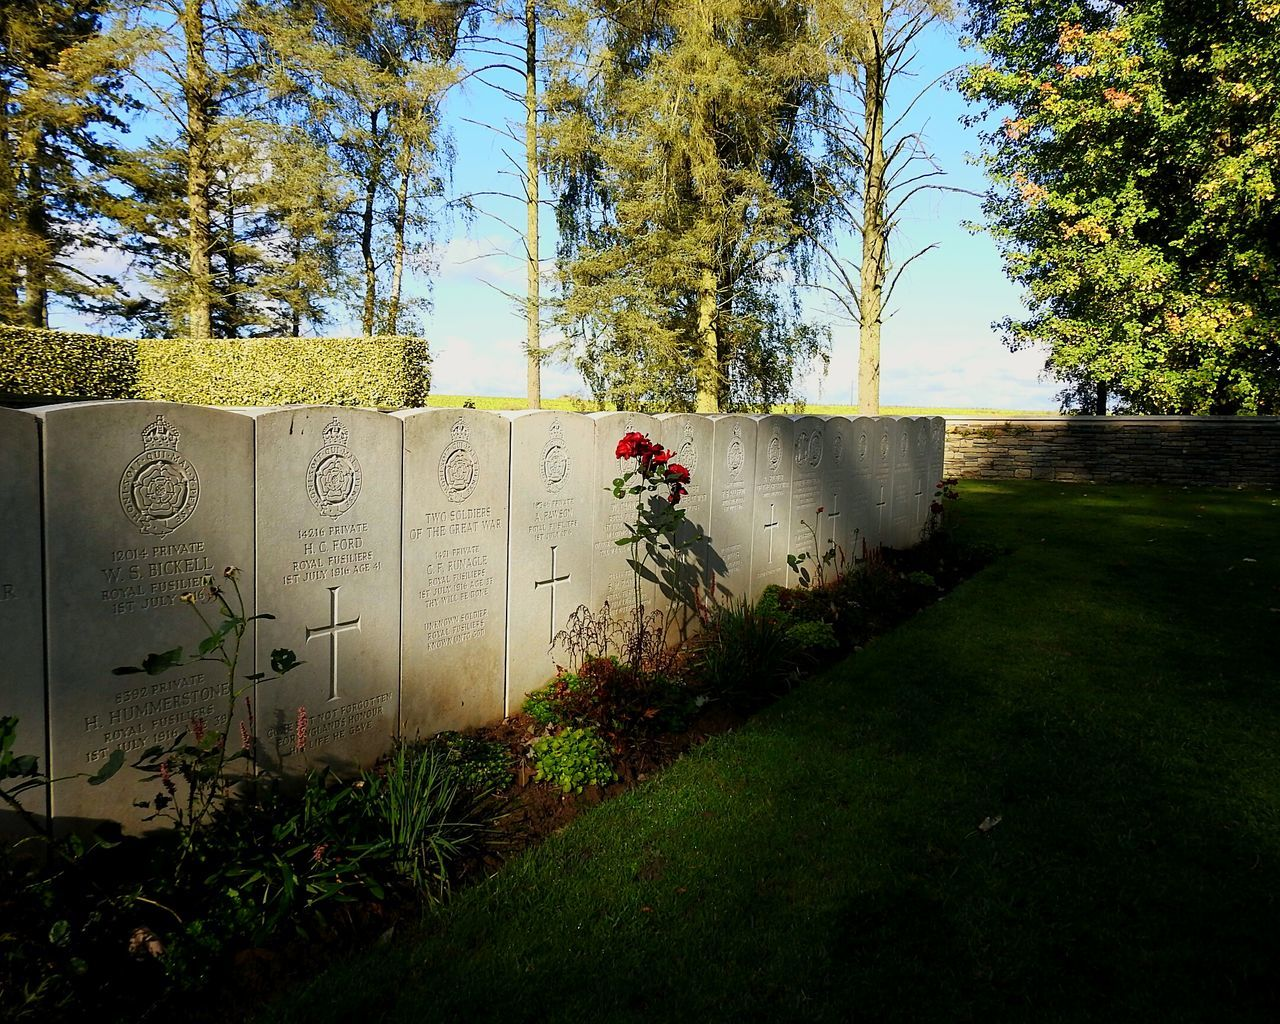 World War 1 Grave The Somme Remembrance World War 1 Memorial Gravestone Human Representation Ww1 Memorial Ww1 War Hero Scottish War Heroes Sunbeam Newfoundland Memorial Park